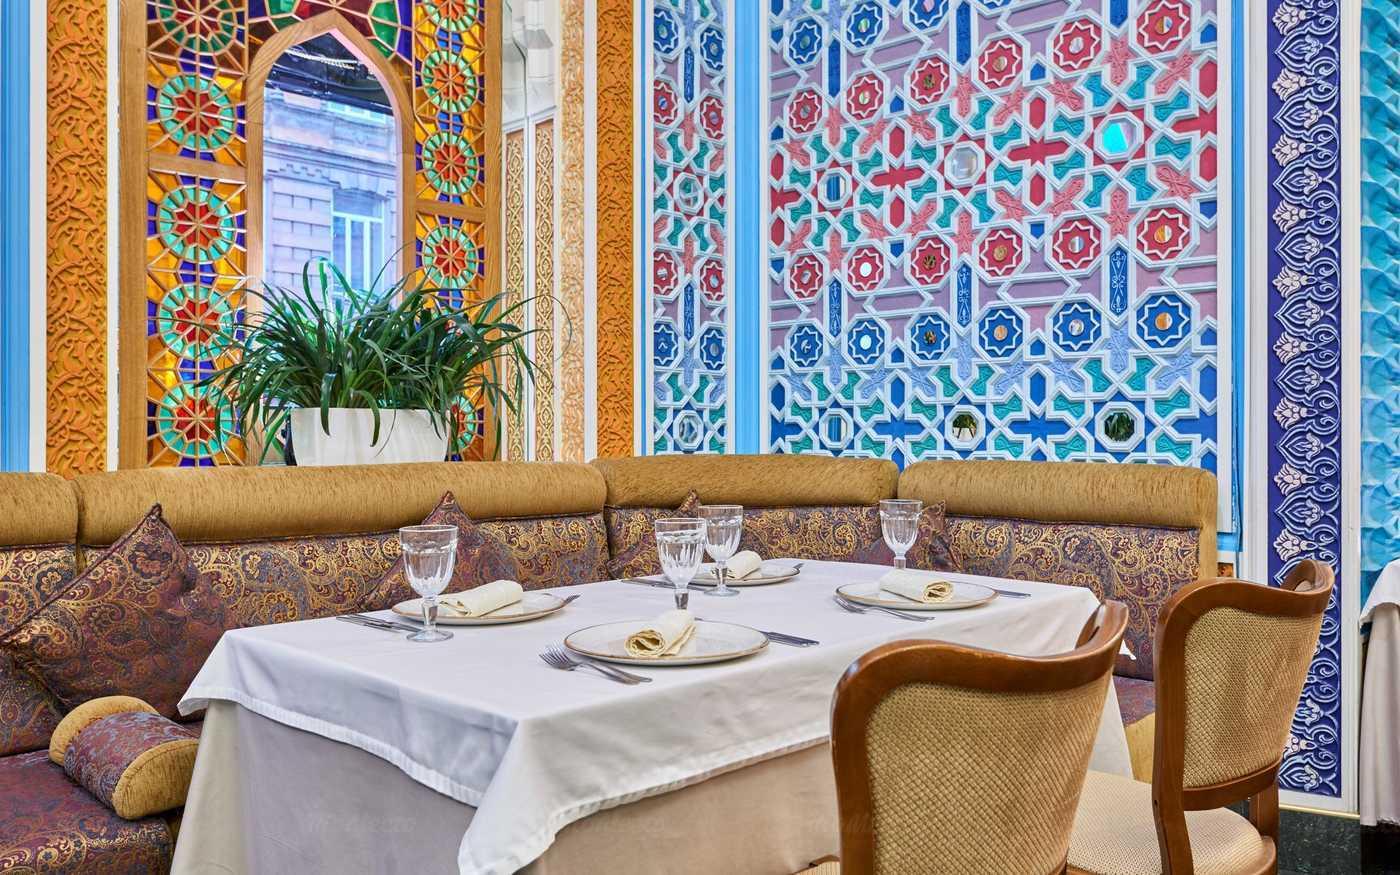 Ресторан Баку на Садовой улице